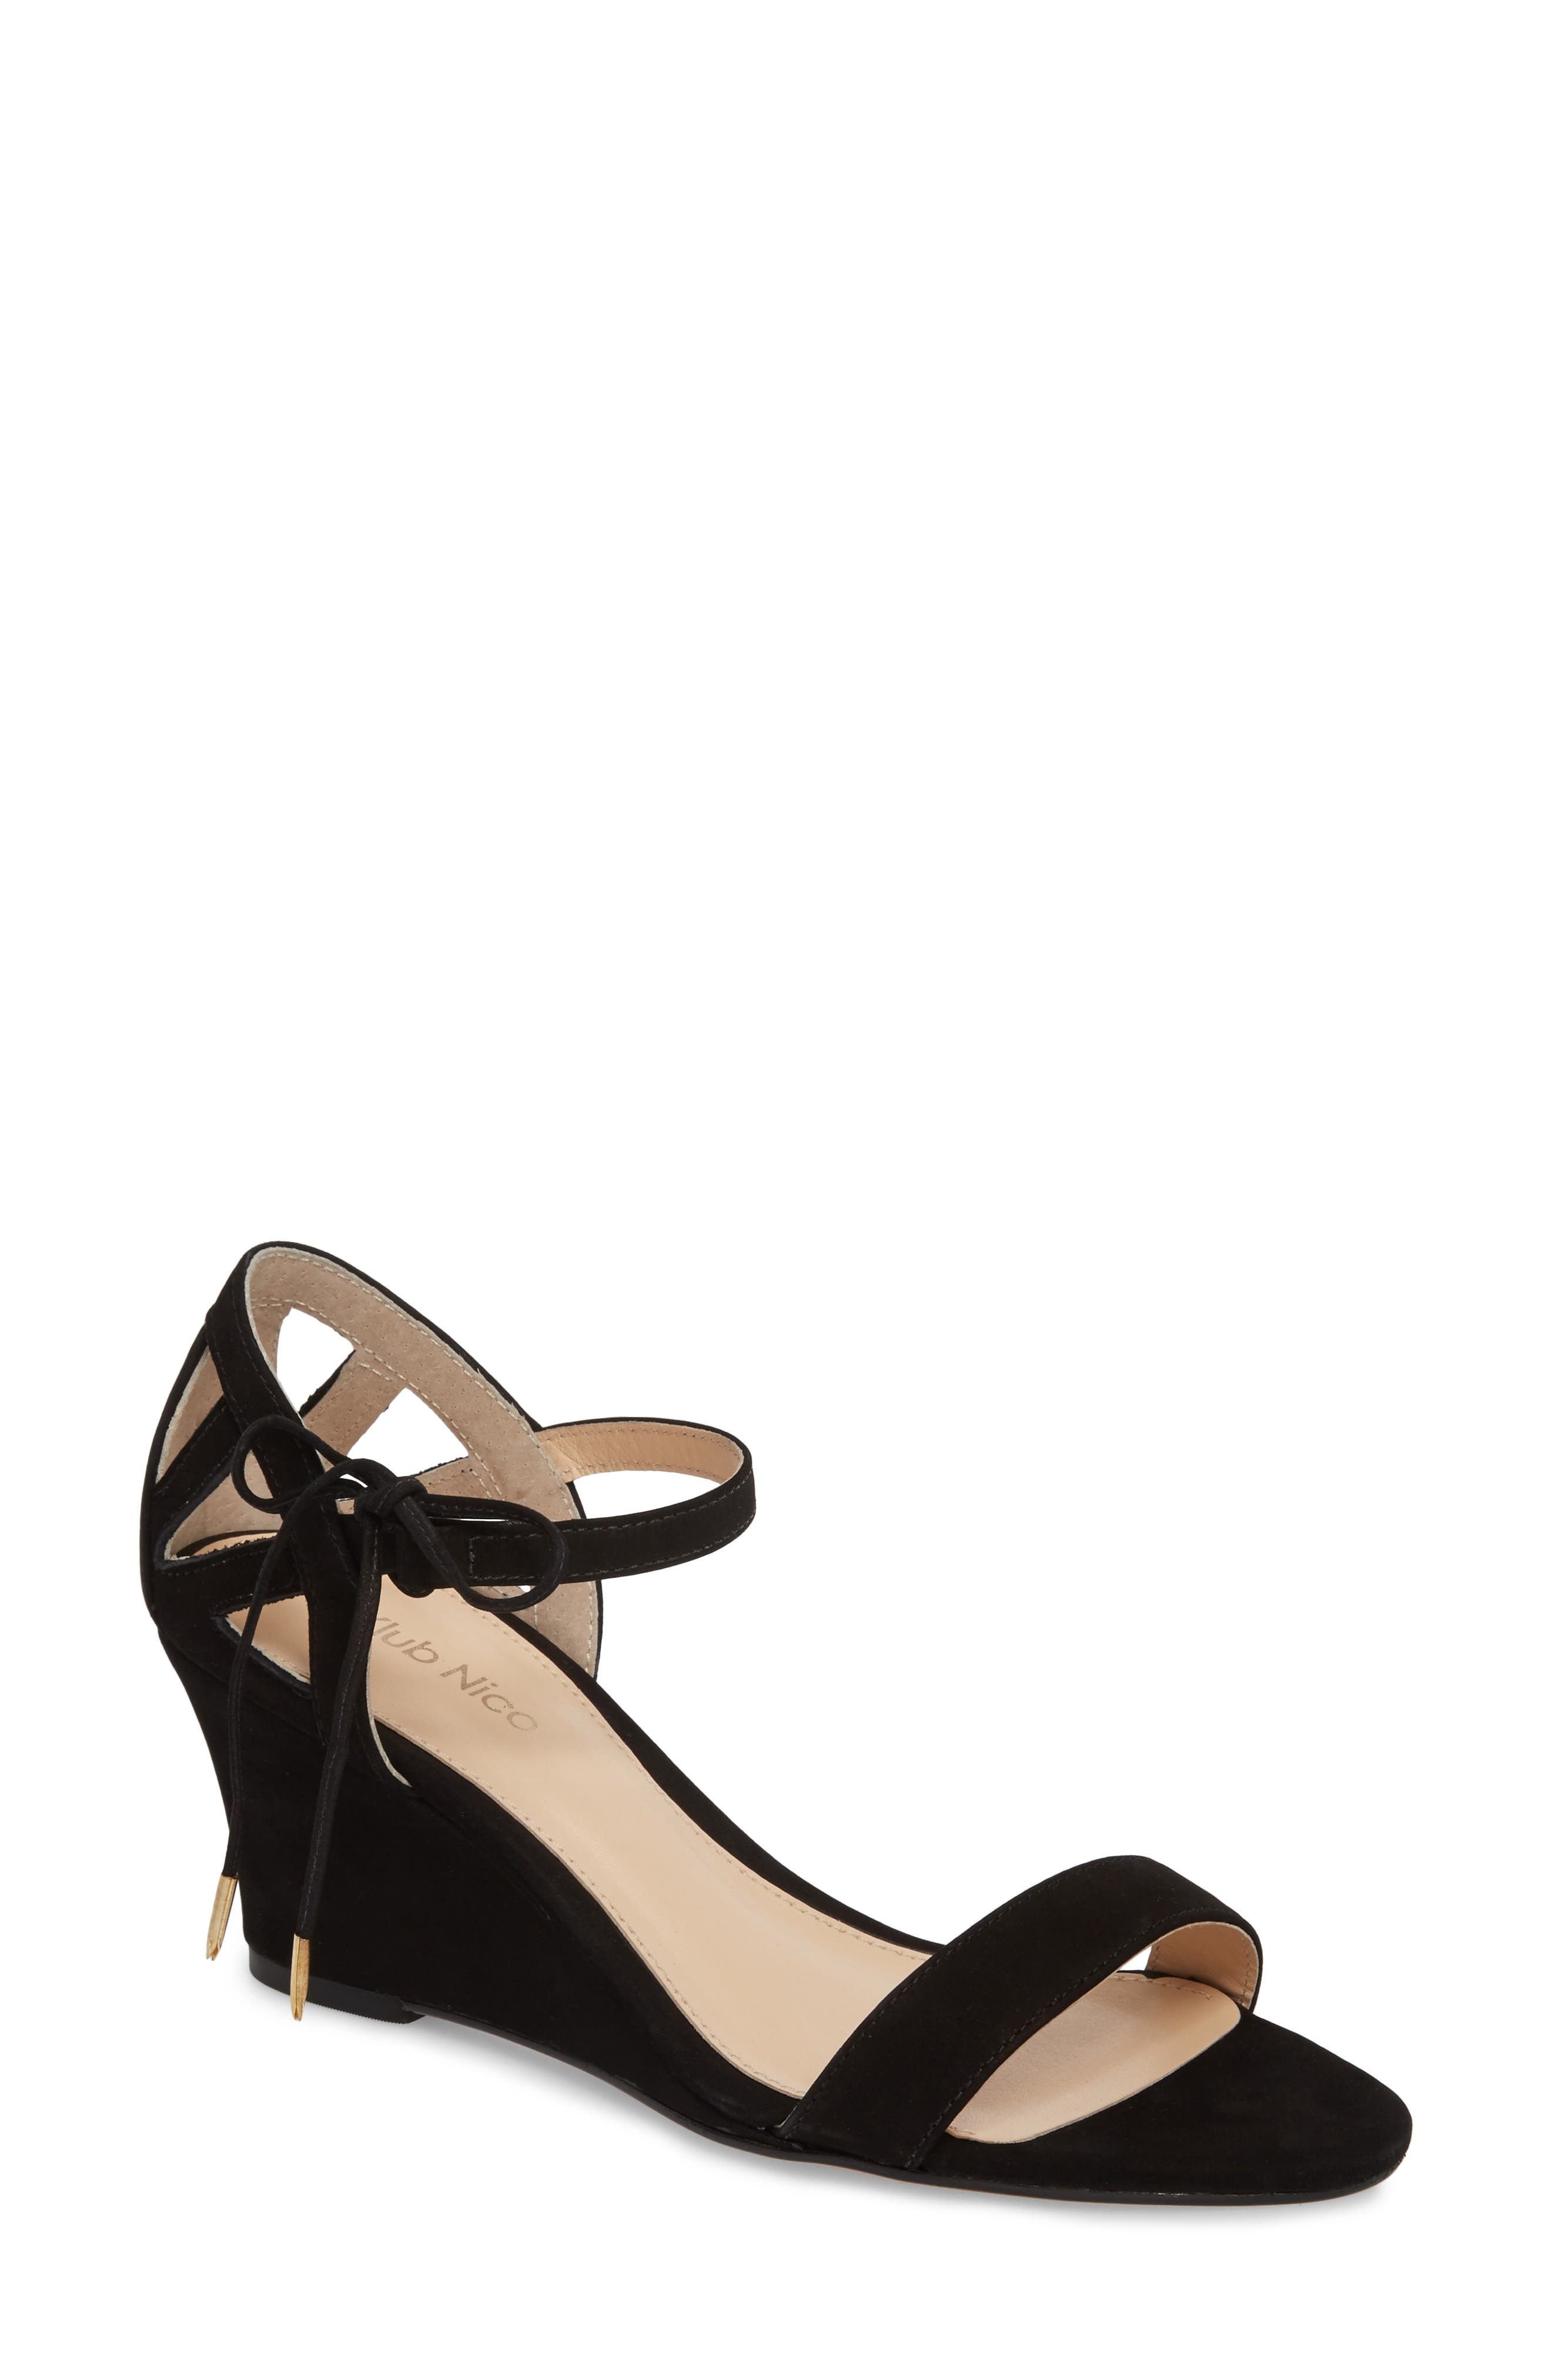 Kaeli Wedge Sandal,                         Main,                         color, BLACK LEATHER